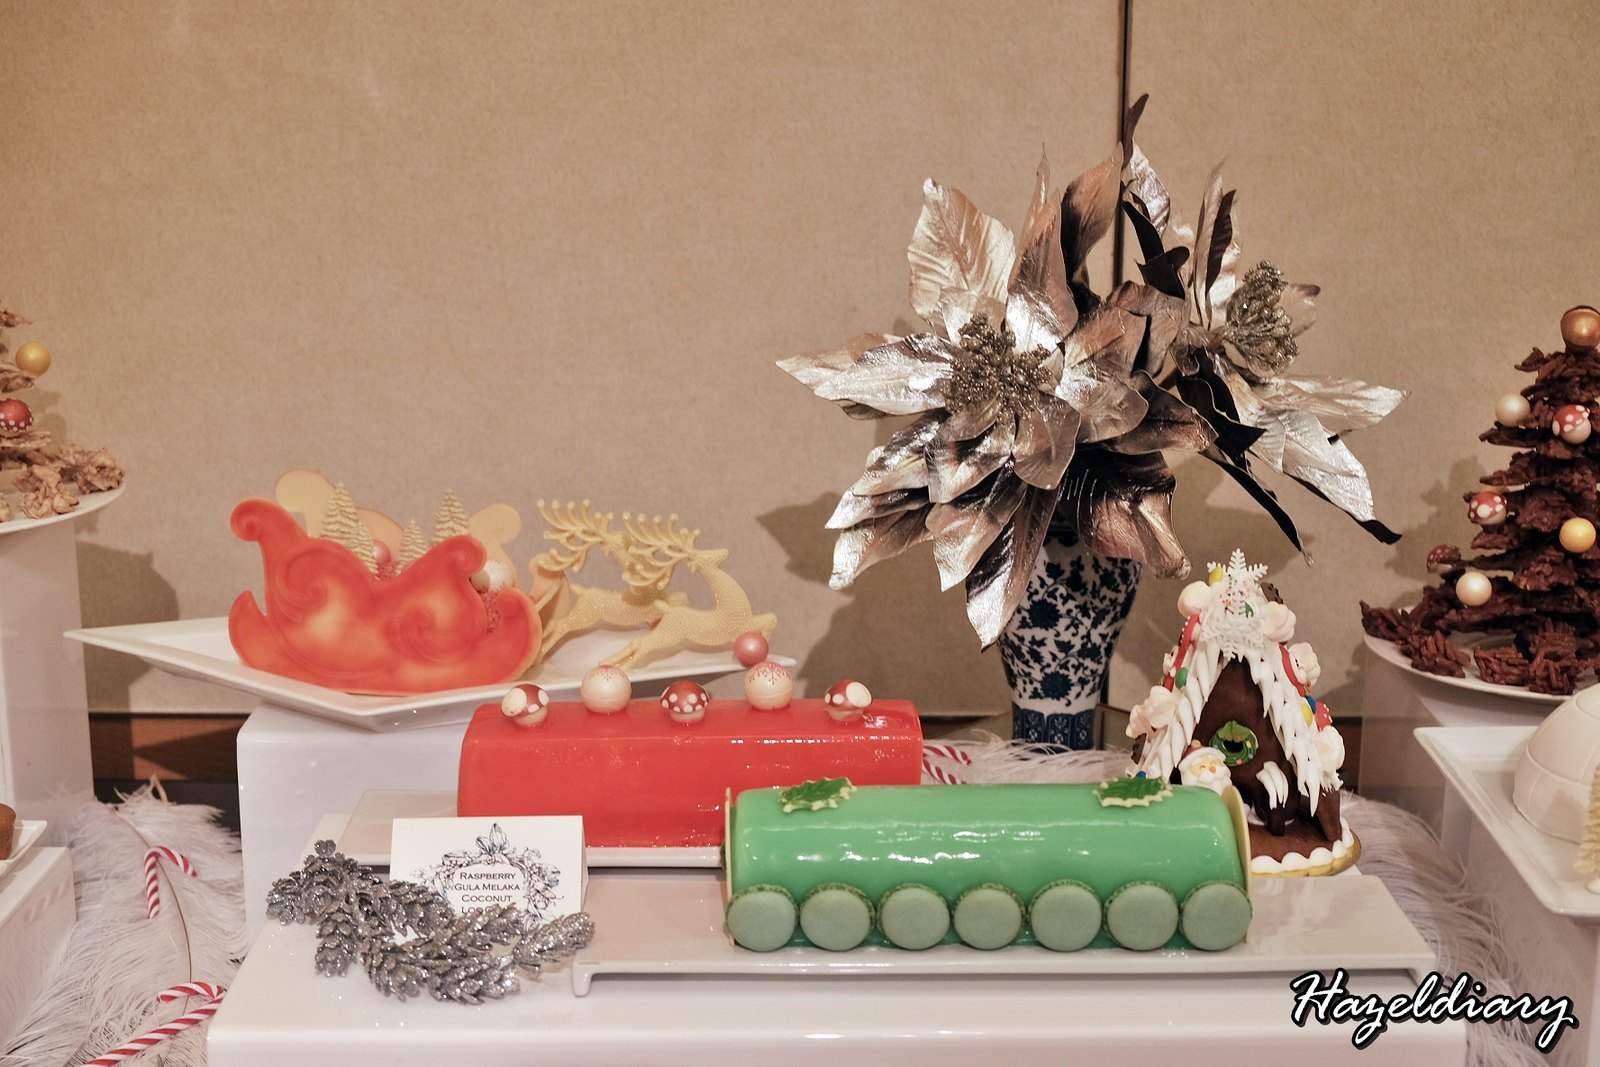 Singapore Marriott Tang Hotel-Christmas Dessert-Logcakes